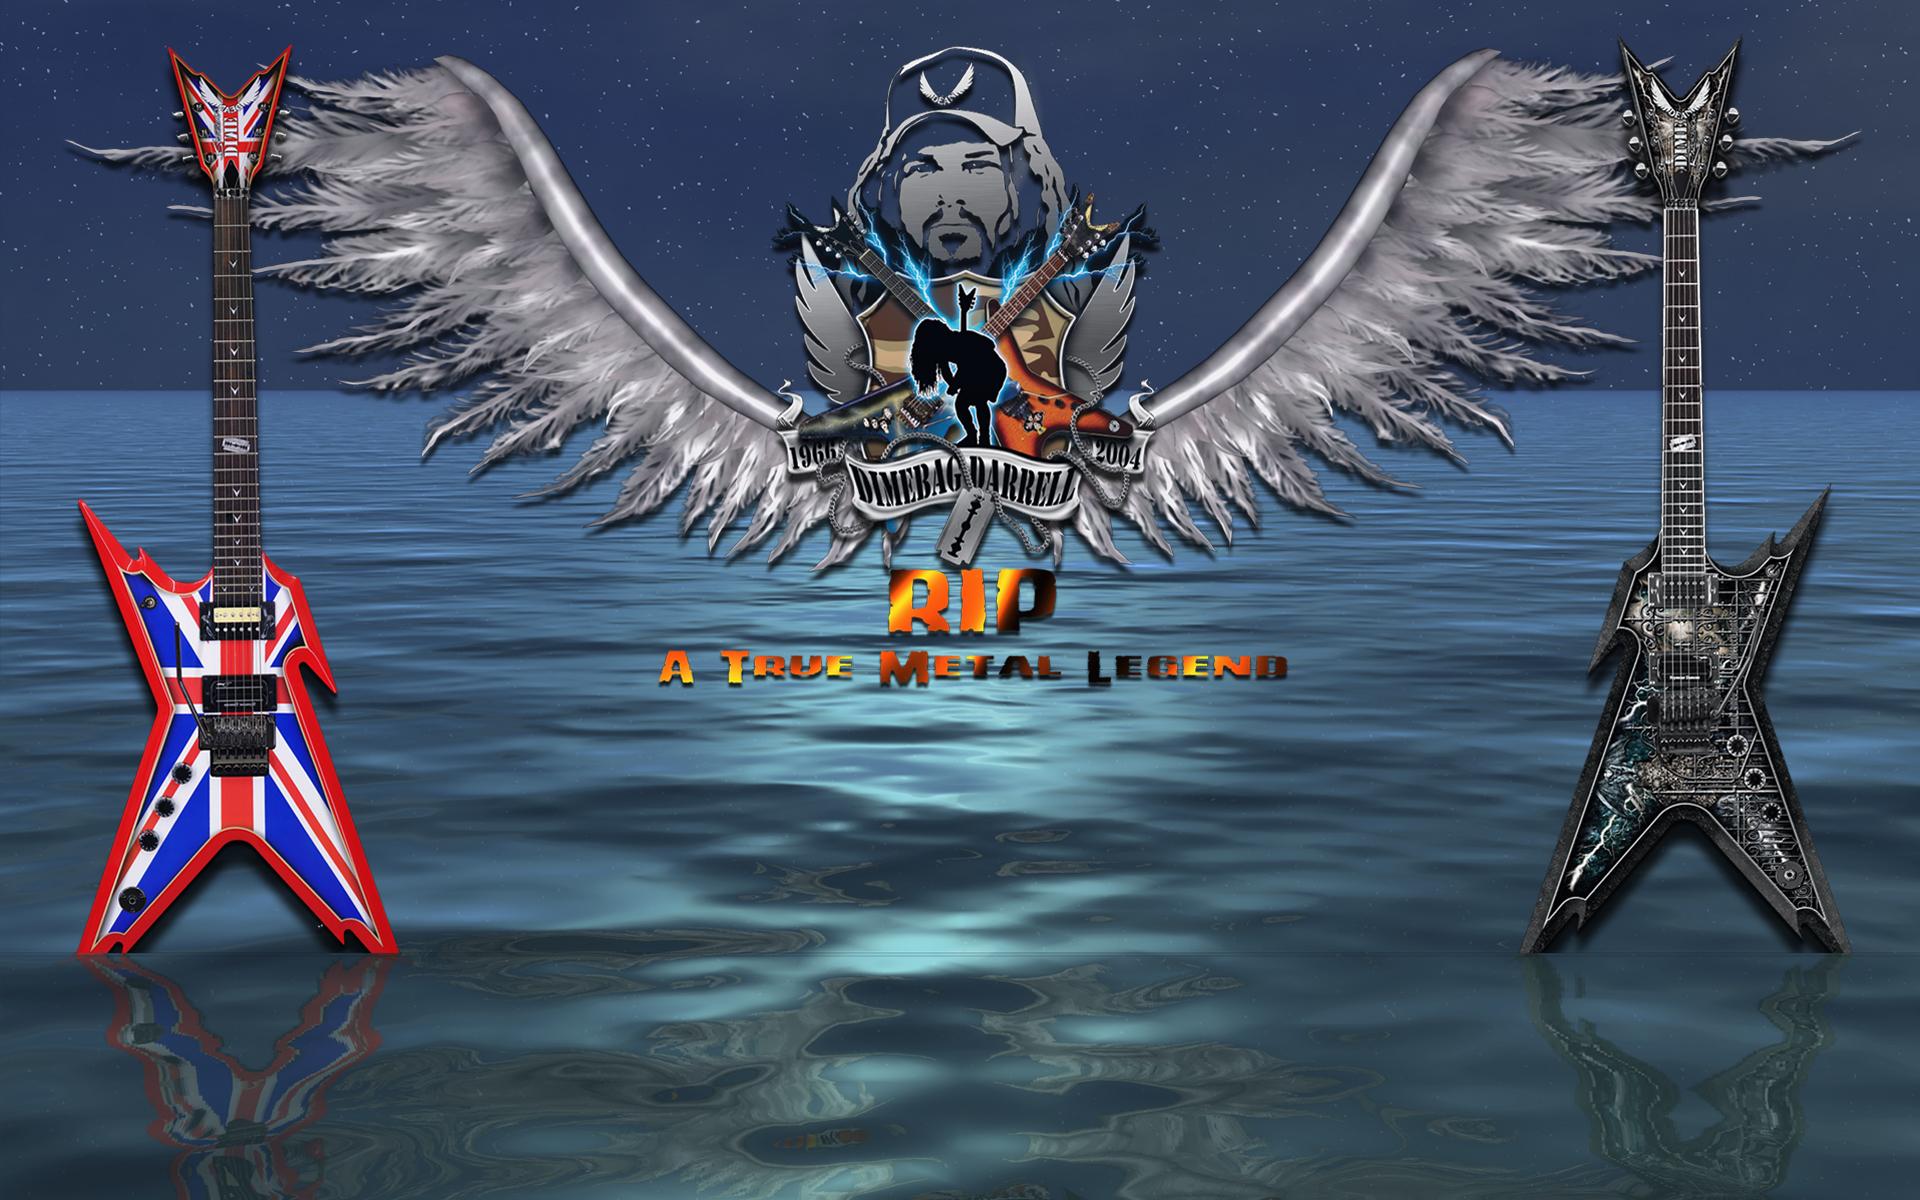 Hot Nfl Wallpaper Site Dimebag Darrell Tribute 2009 Wallpaper